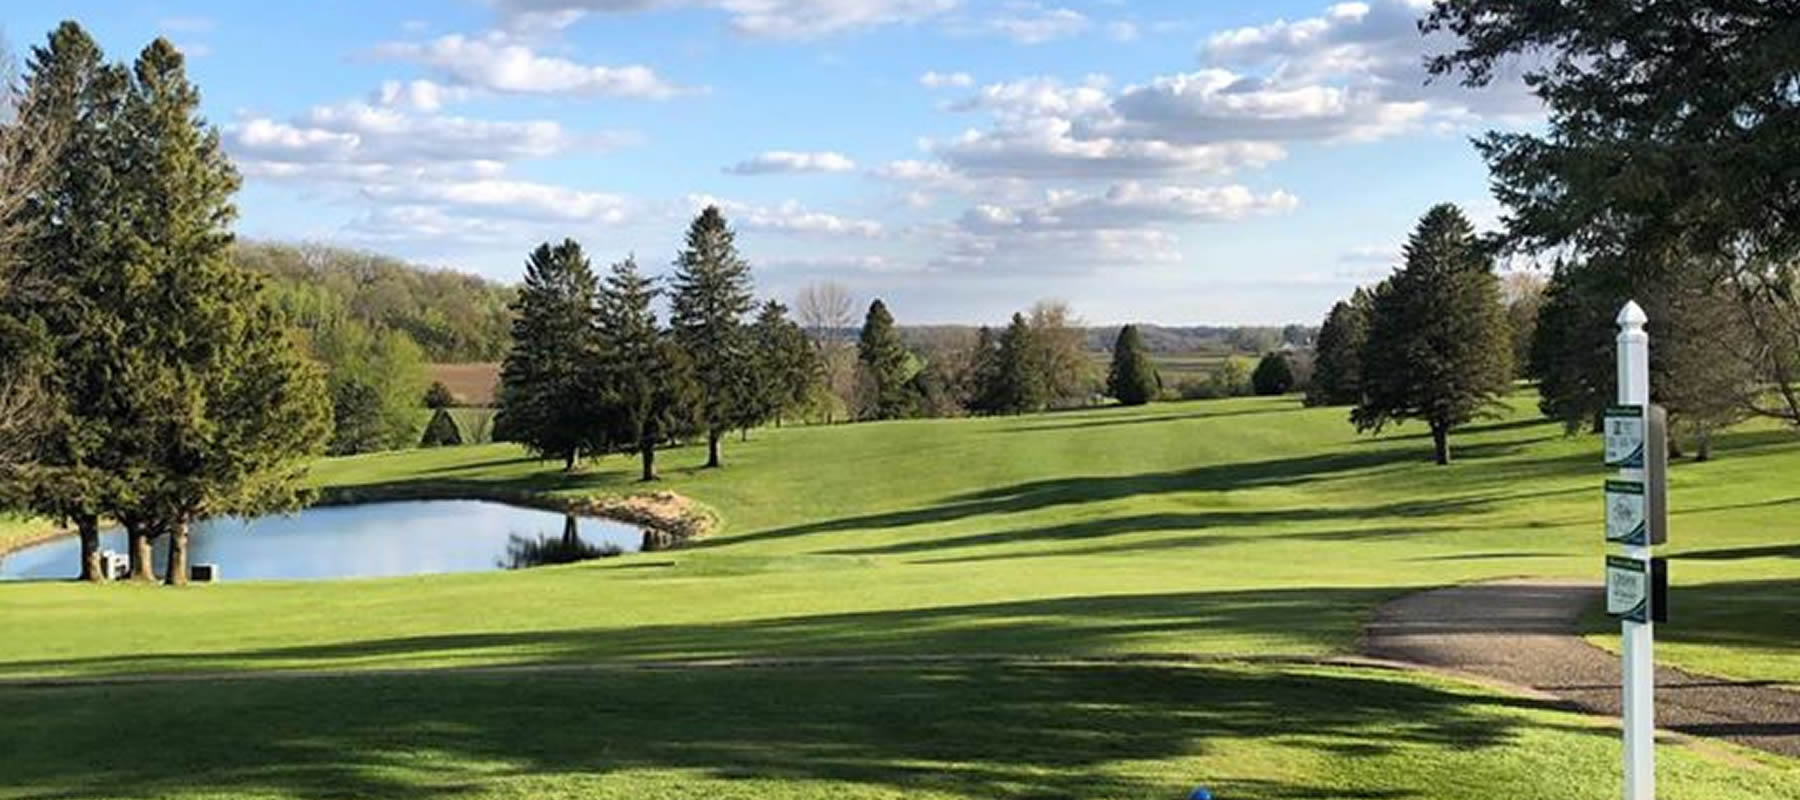 Preston Golf Course - Preston, Minnesota - 9 Hole Course in Southeast Minnesota near Lanesboro, Fountain, Spring Valley, Wykoff, Harmony and LeRoy